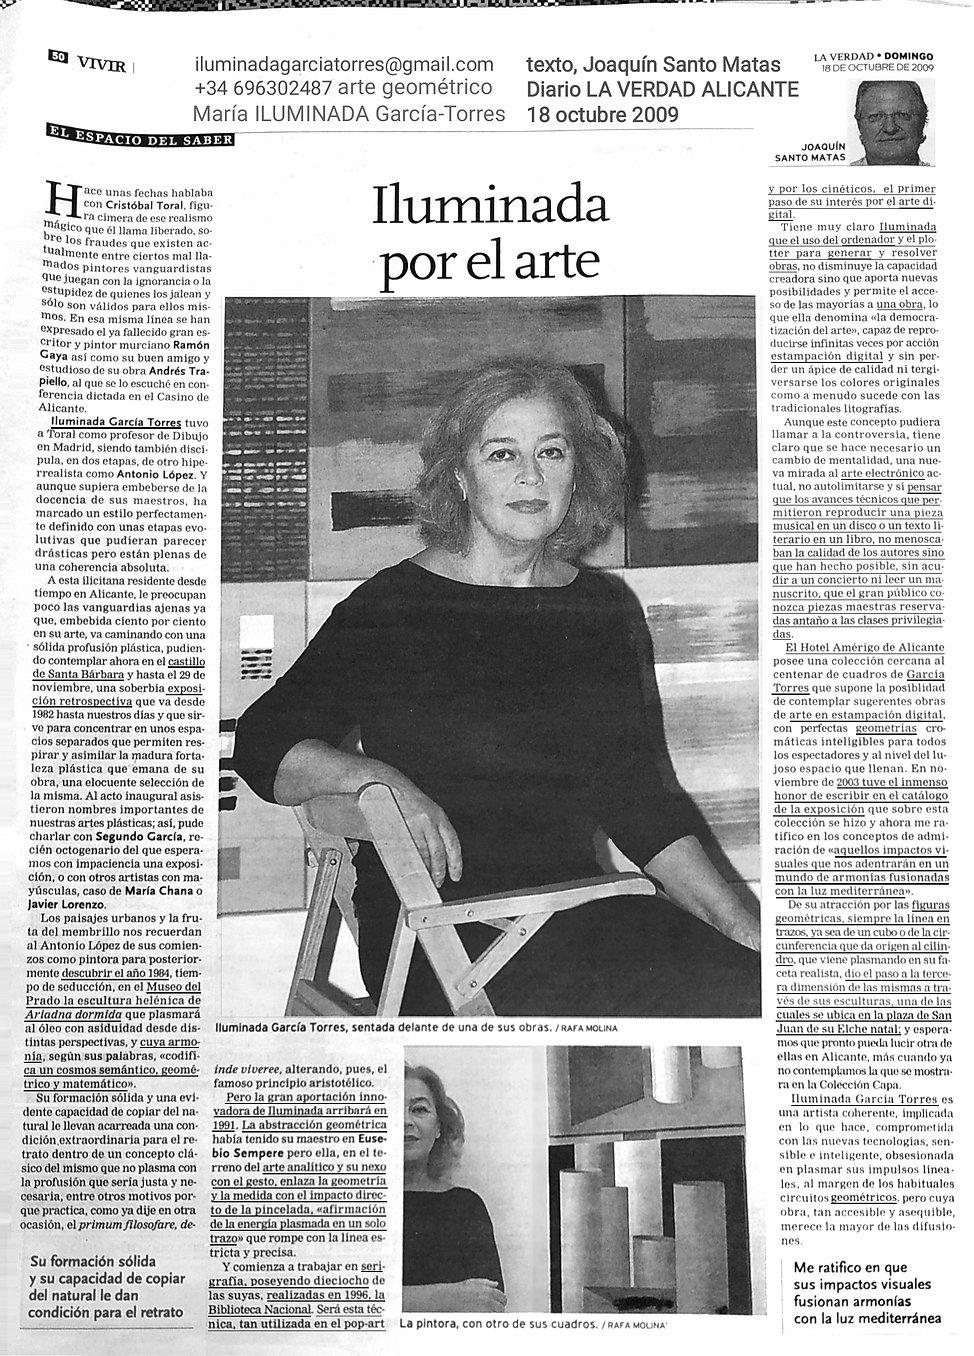 2009 texto Joaquín Santo Matas Diario LA